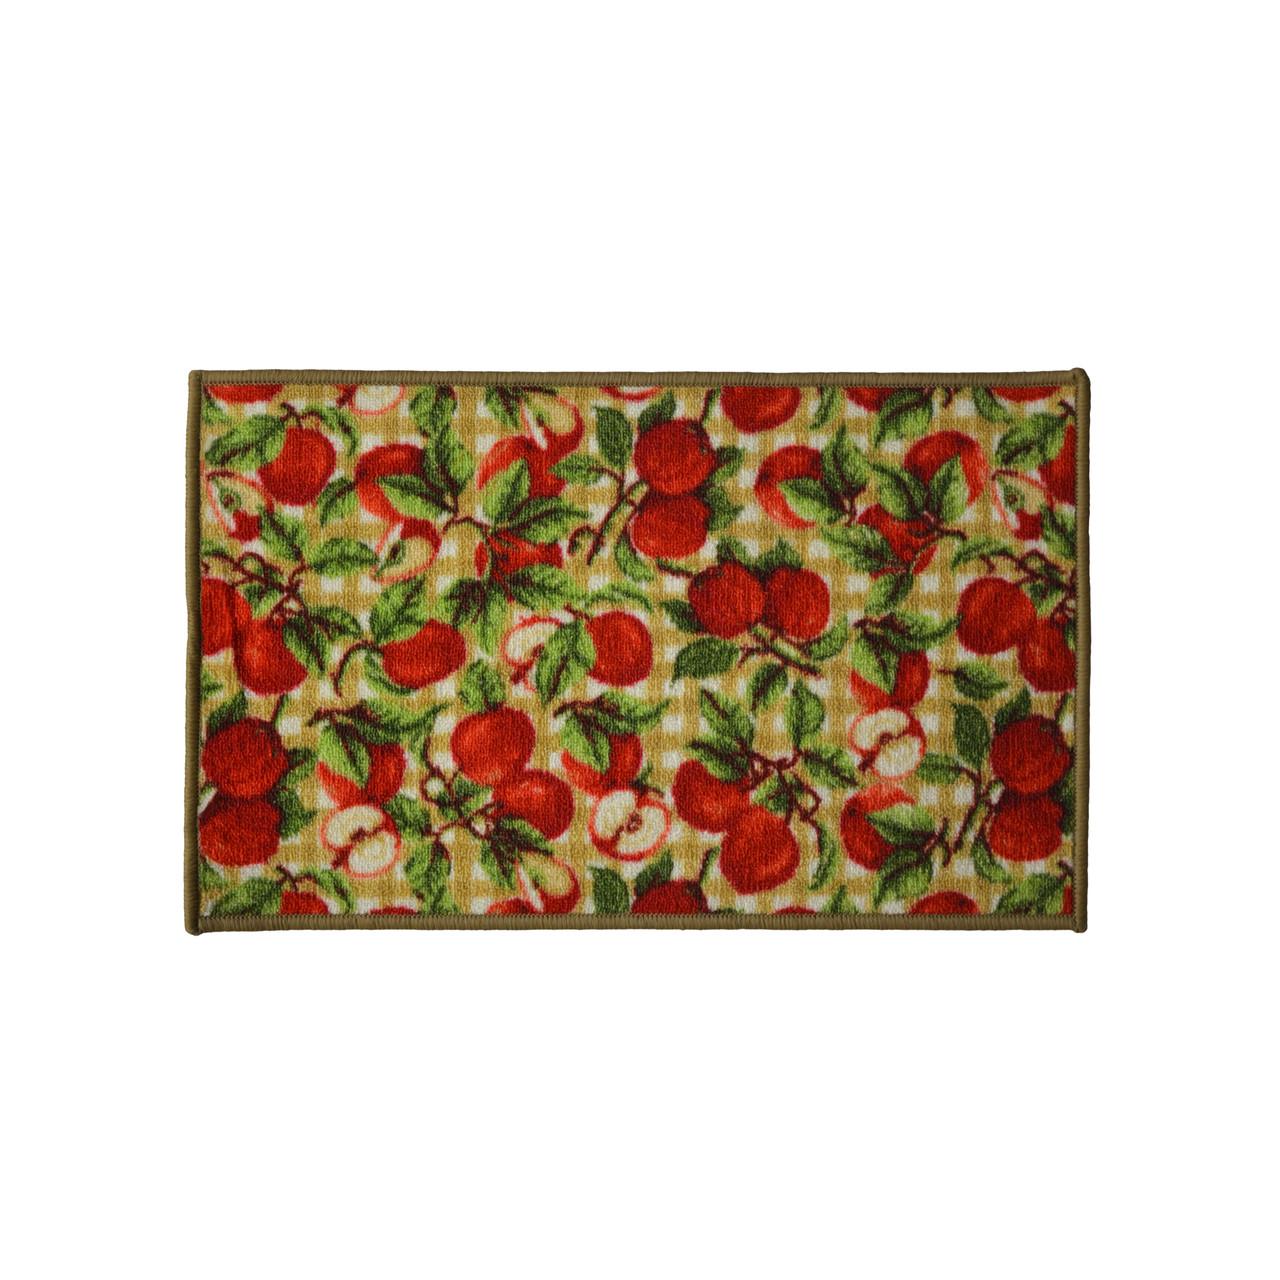 Picnic Apple 18x30 Rectangle Kitchen Rug, Area Rug, Mat, Carpet, Non-Skid  Latex Back